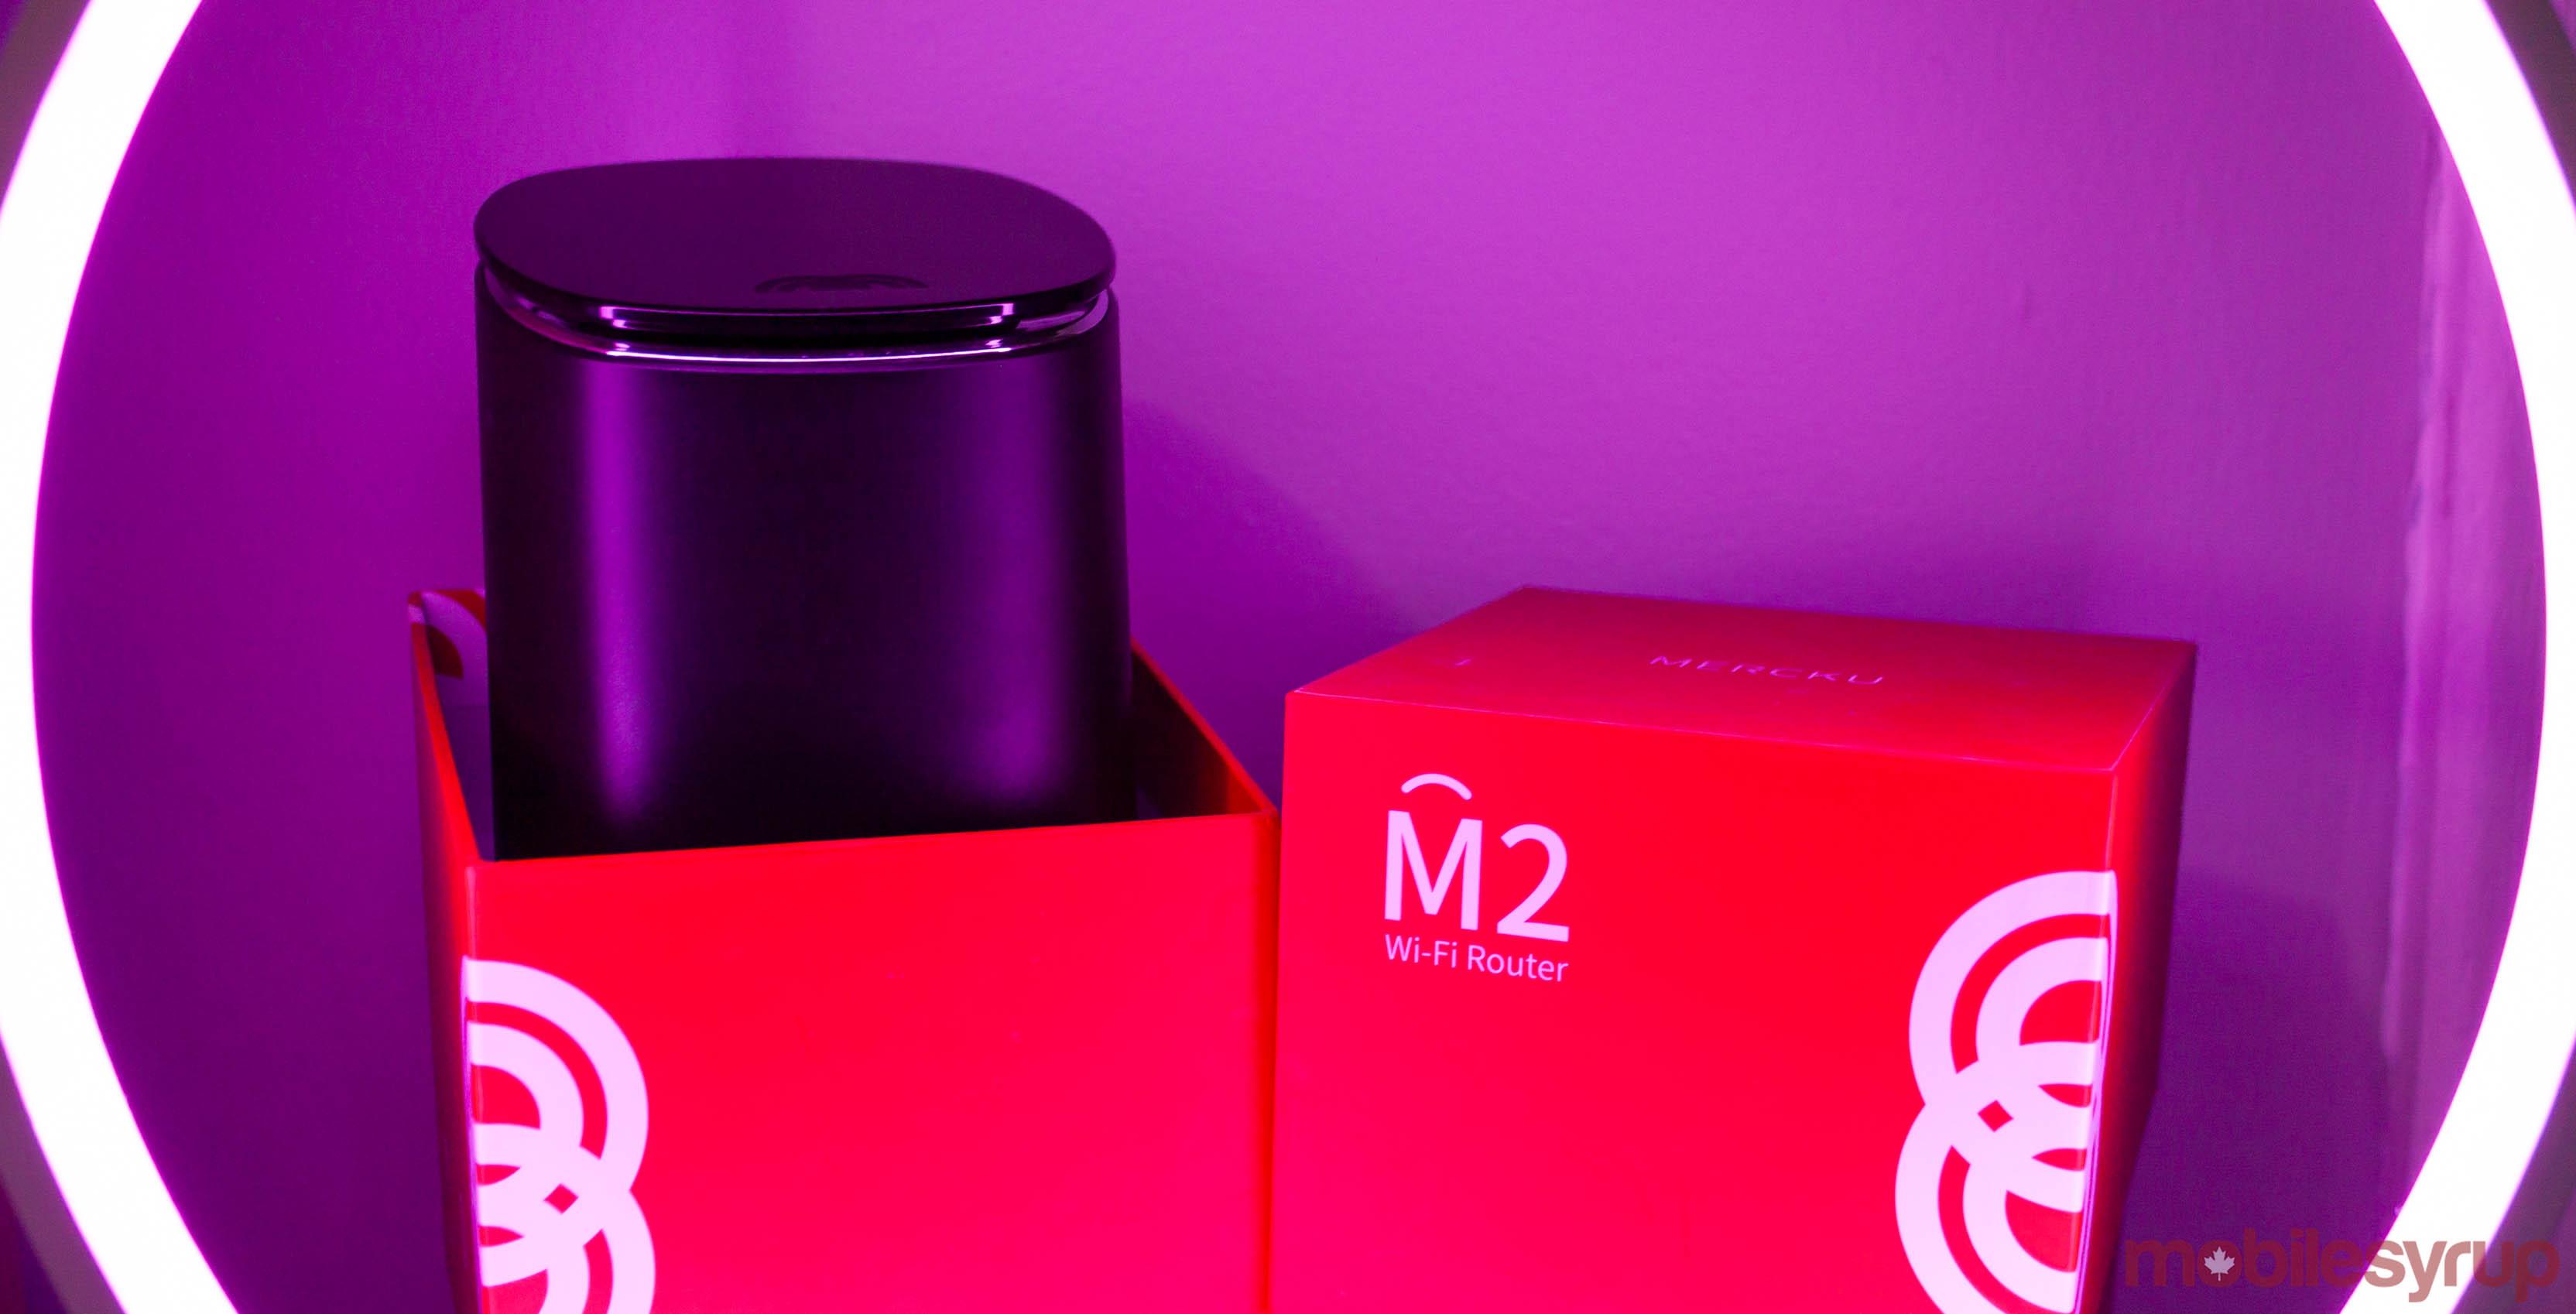 Mercku M2 Wi-Fi router